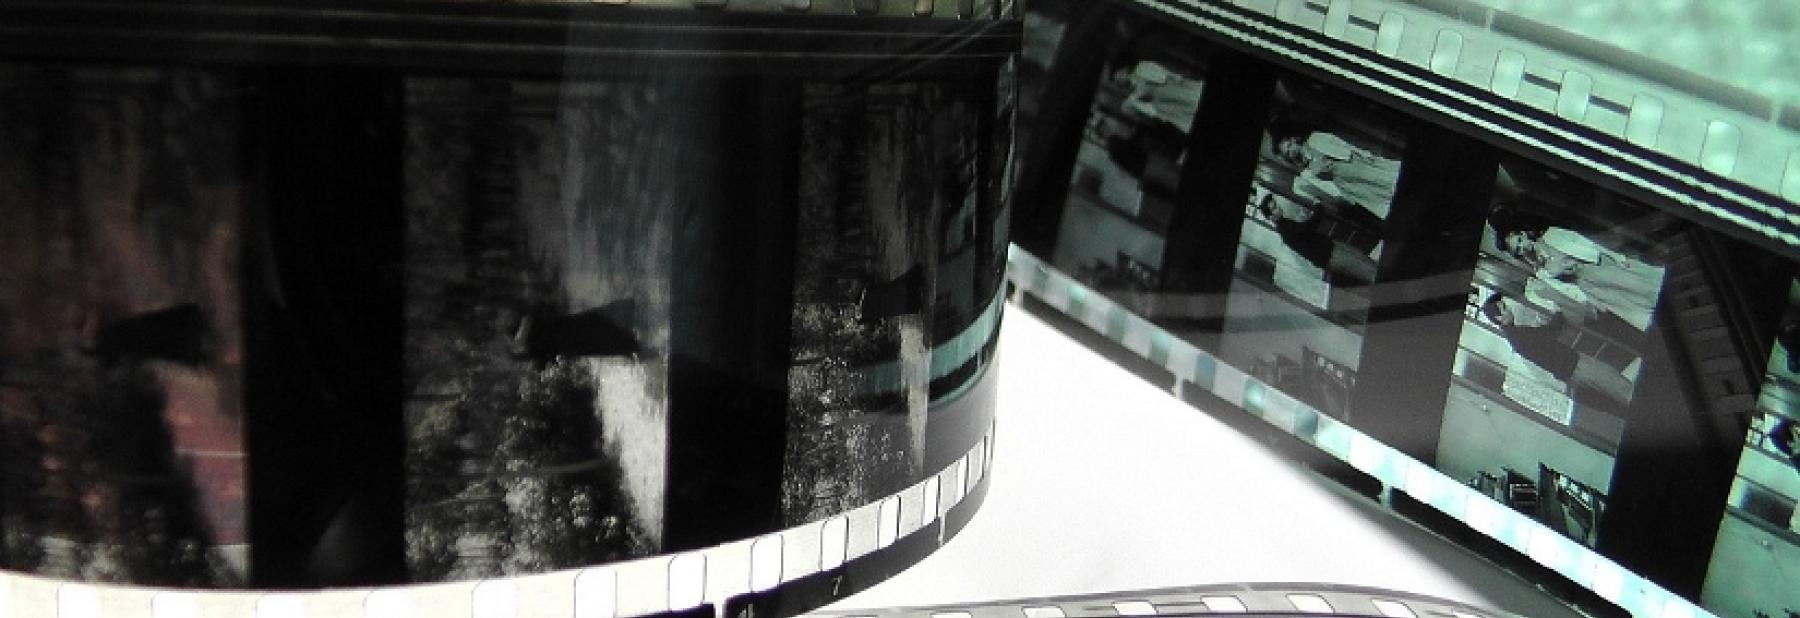 PELLICOLA CINEMATOGRAFICA